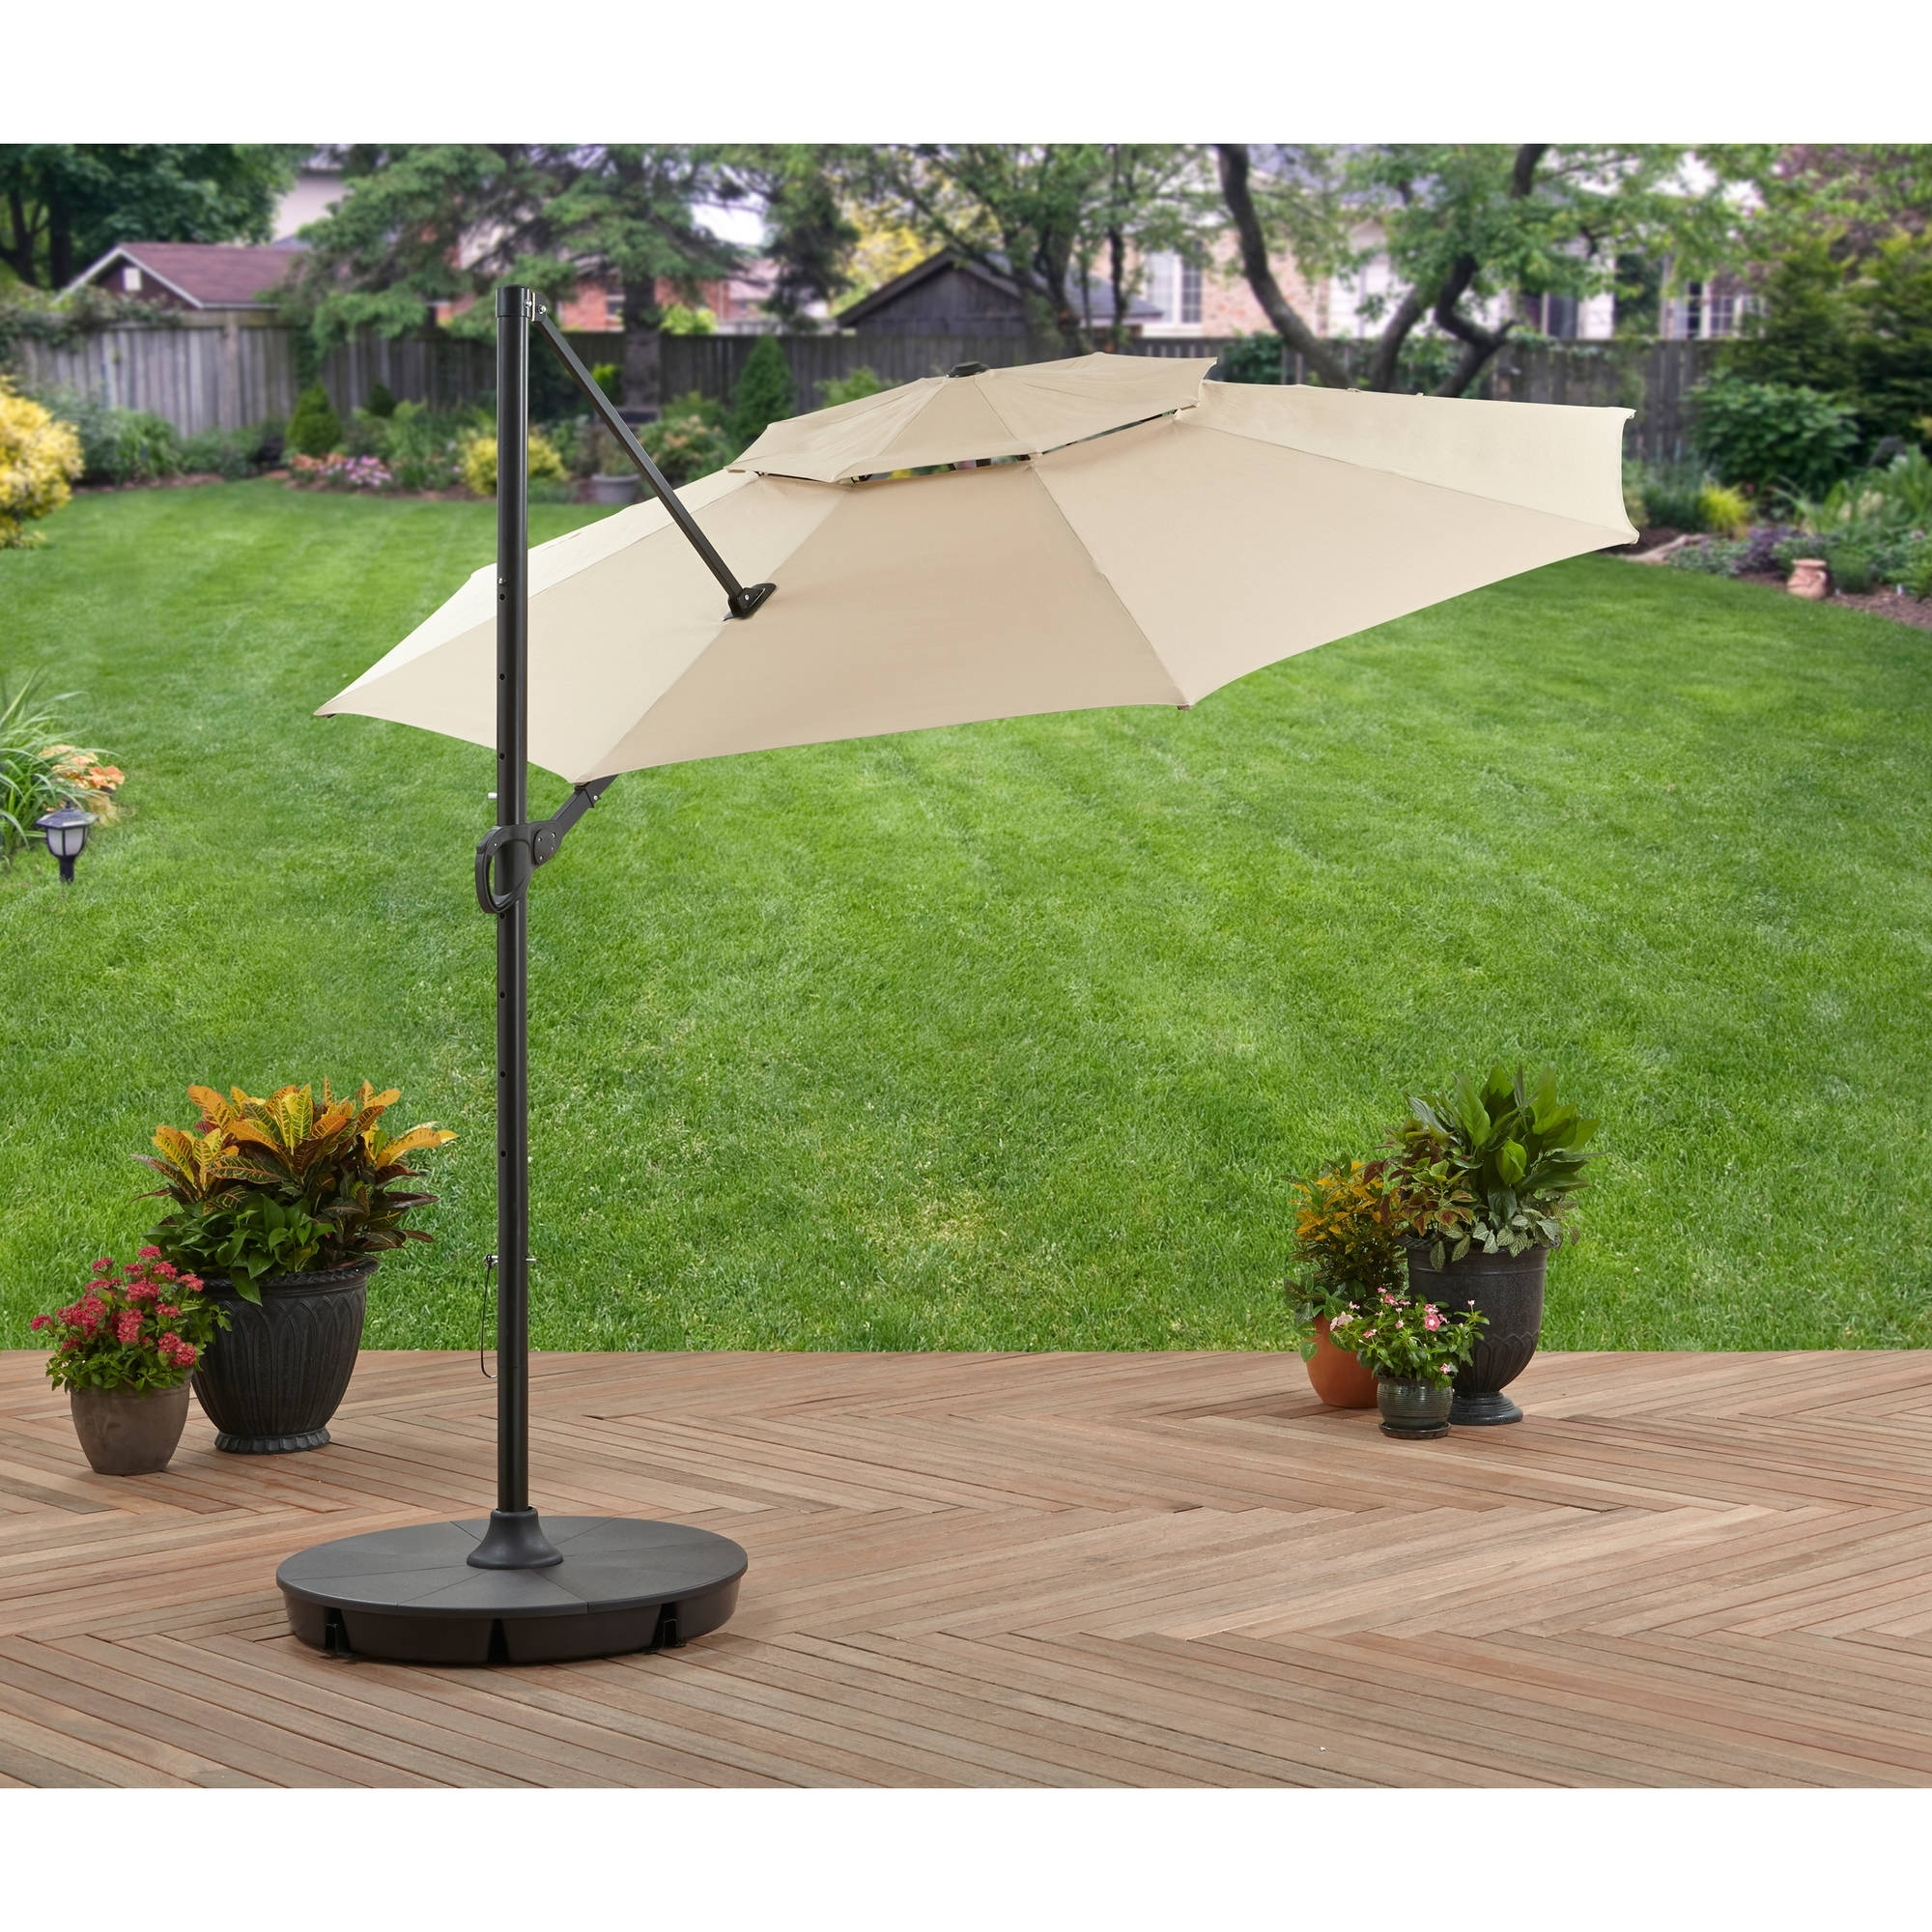 Sunbrella Patio Umbrellas At Walmart Within Favorite Better Homes And Gardens 9' Market Umbrella, Red – Walmart (View 18 of 20)